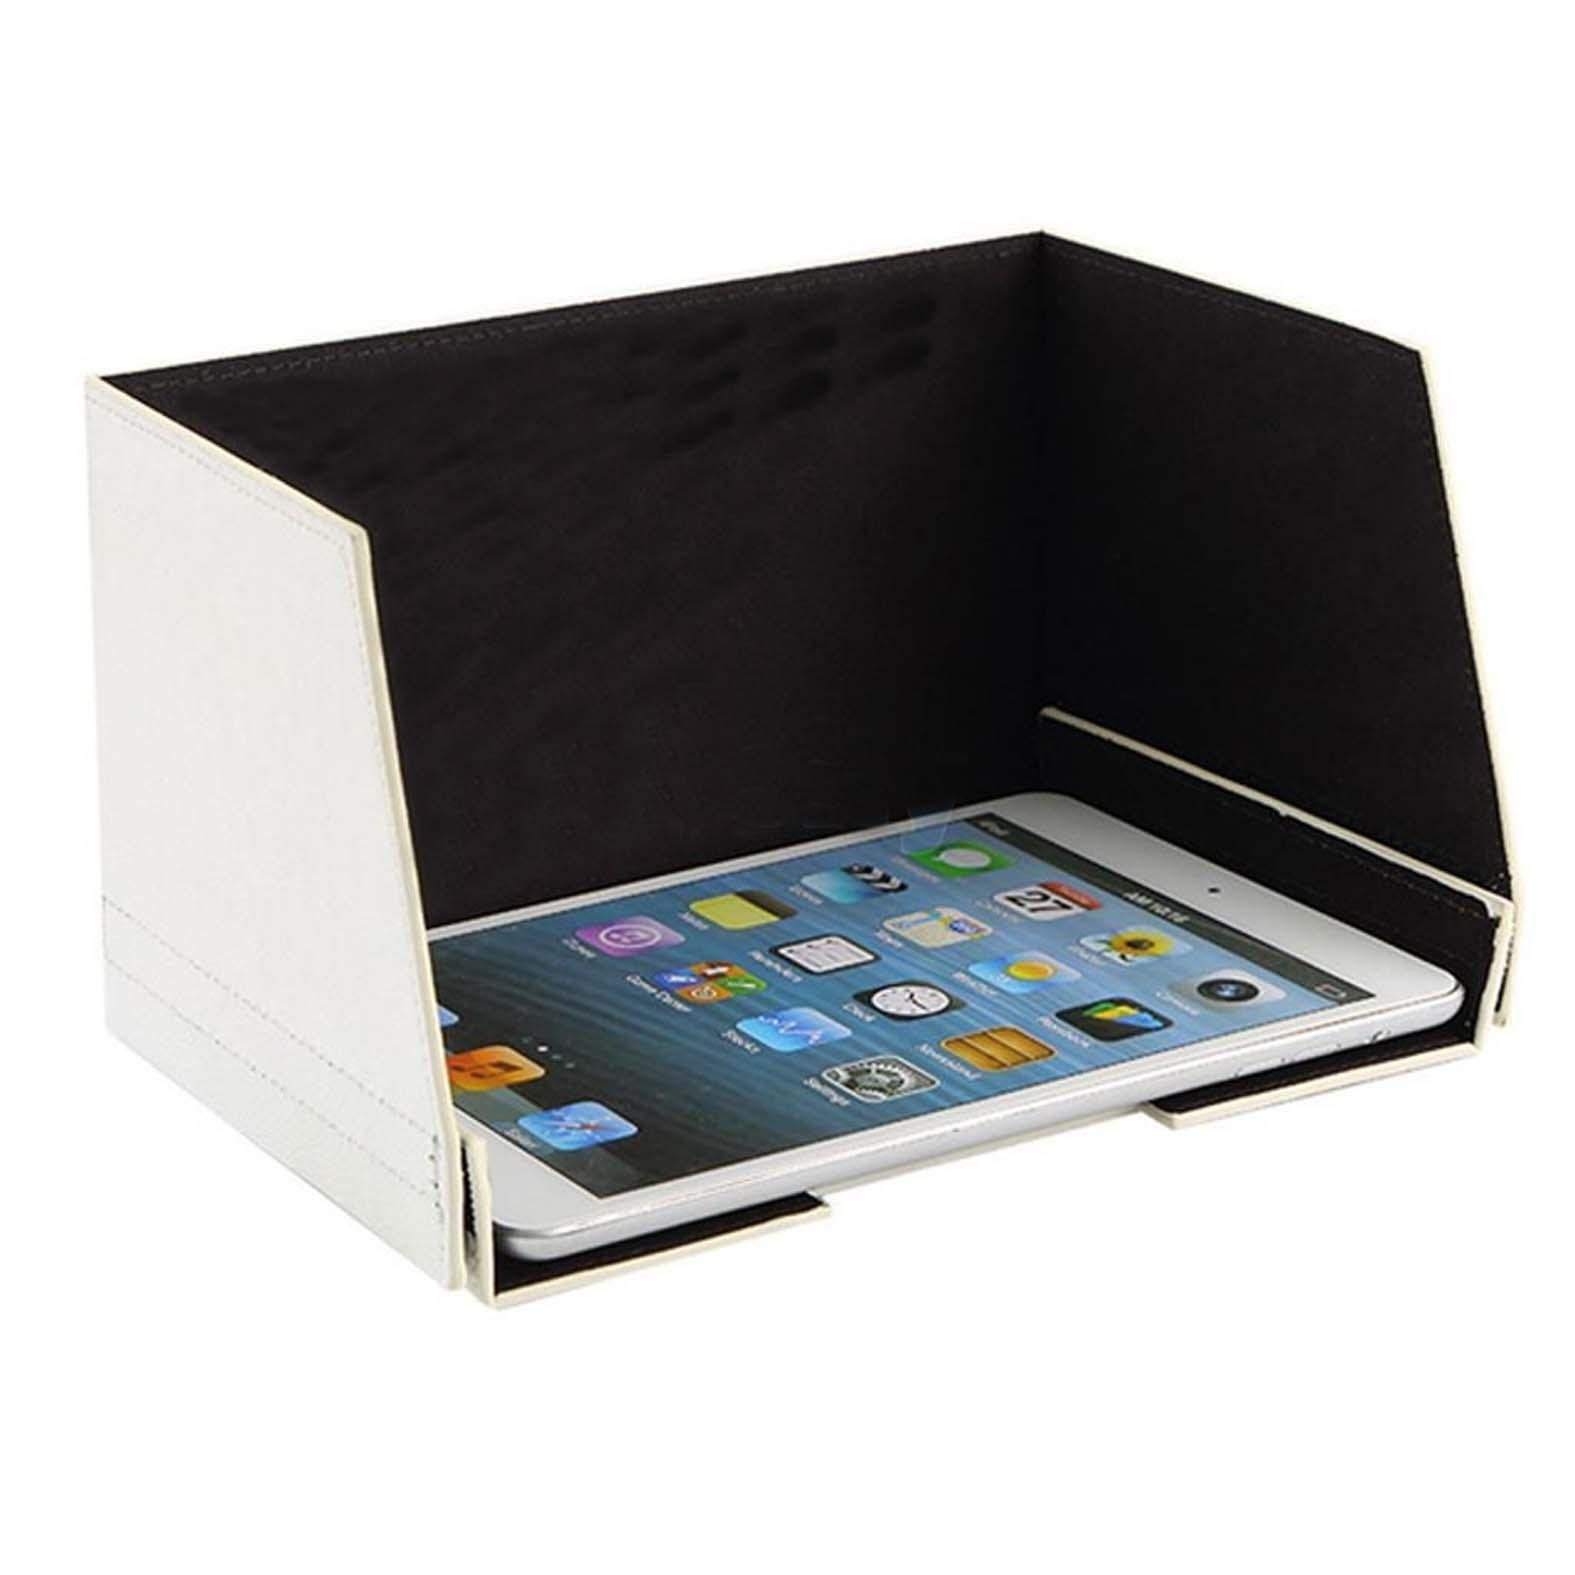 powerday7 Inch iPad mini Sunshade Sun Hood for DJI Inspire 1 Phantom 3 Pro Advanced FPV 7.9Inch